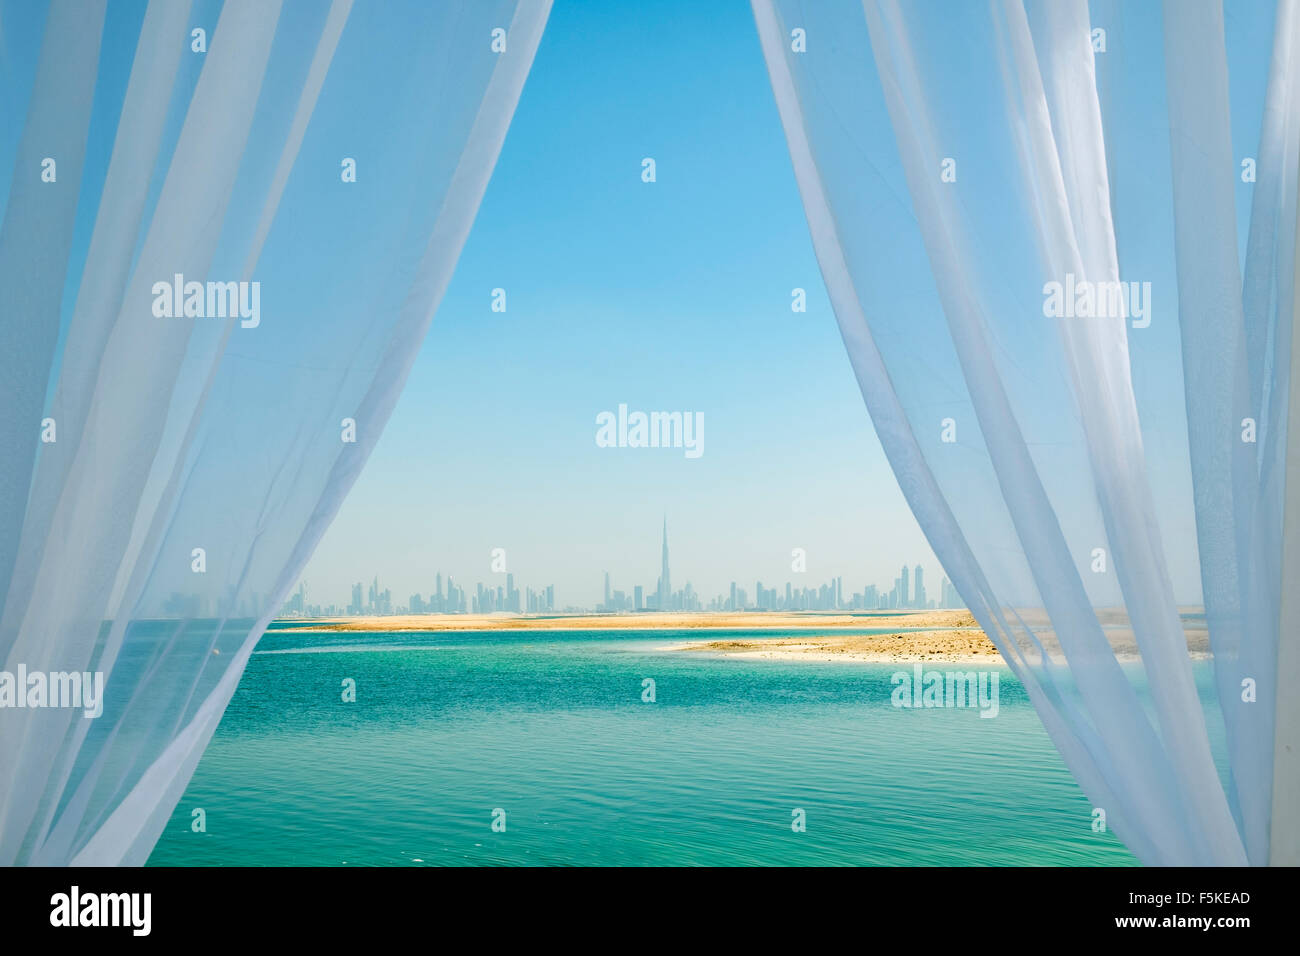 Skyline of Dubai from The Island Lebanon beach resort on a man made island, part of The World off Dubai, United - Stock Image